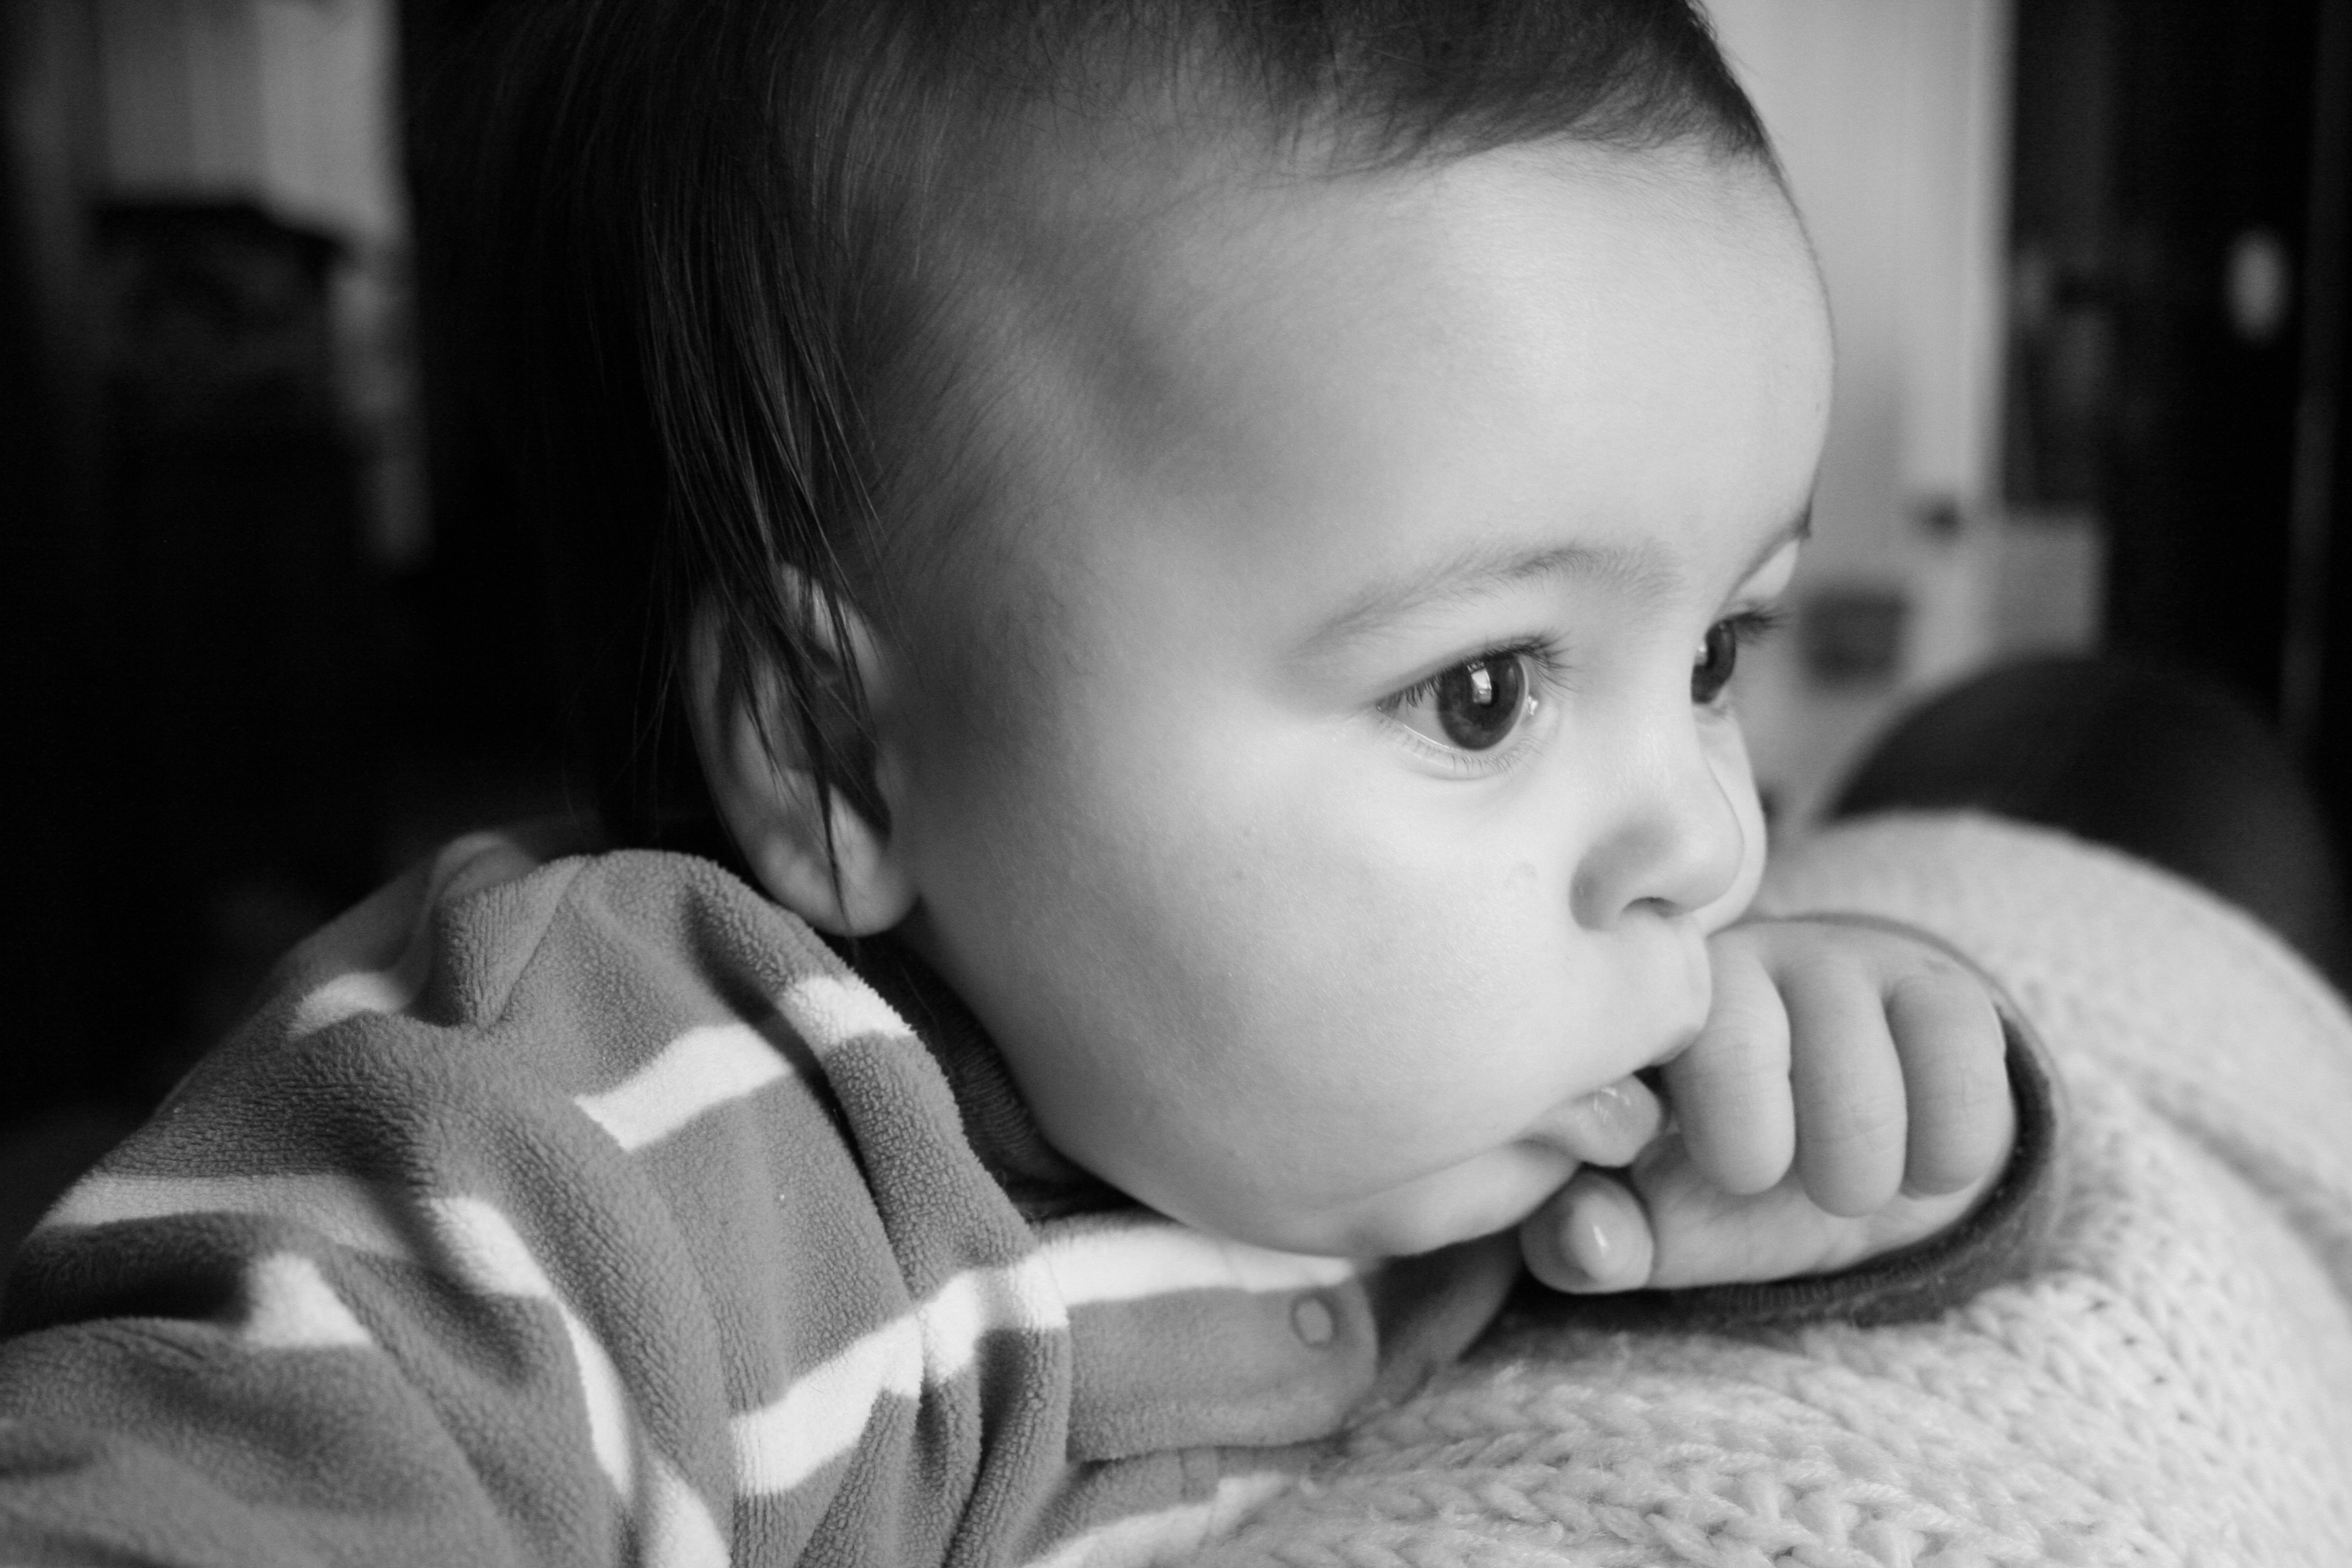 Capturing innocence... in manual mode